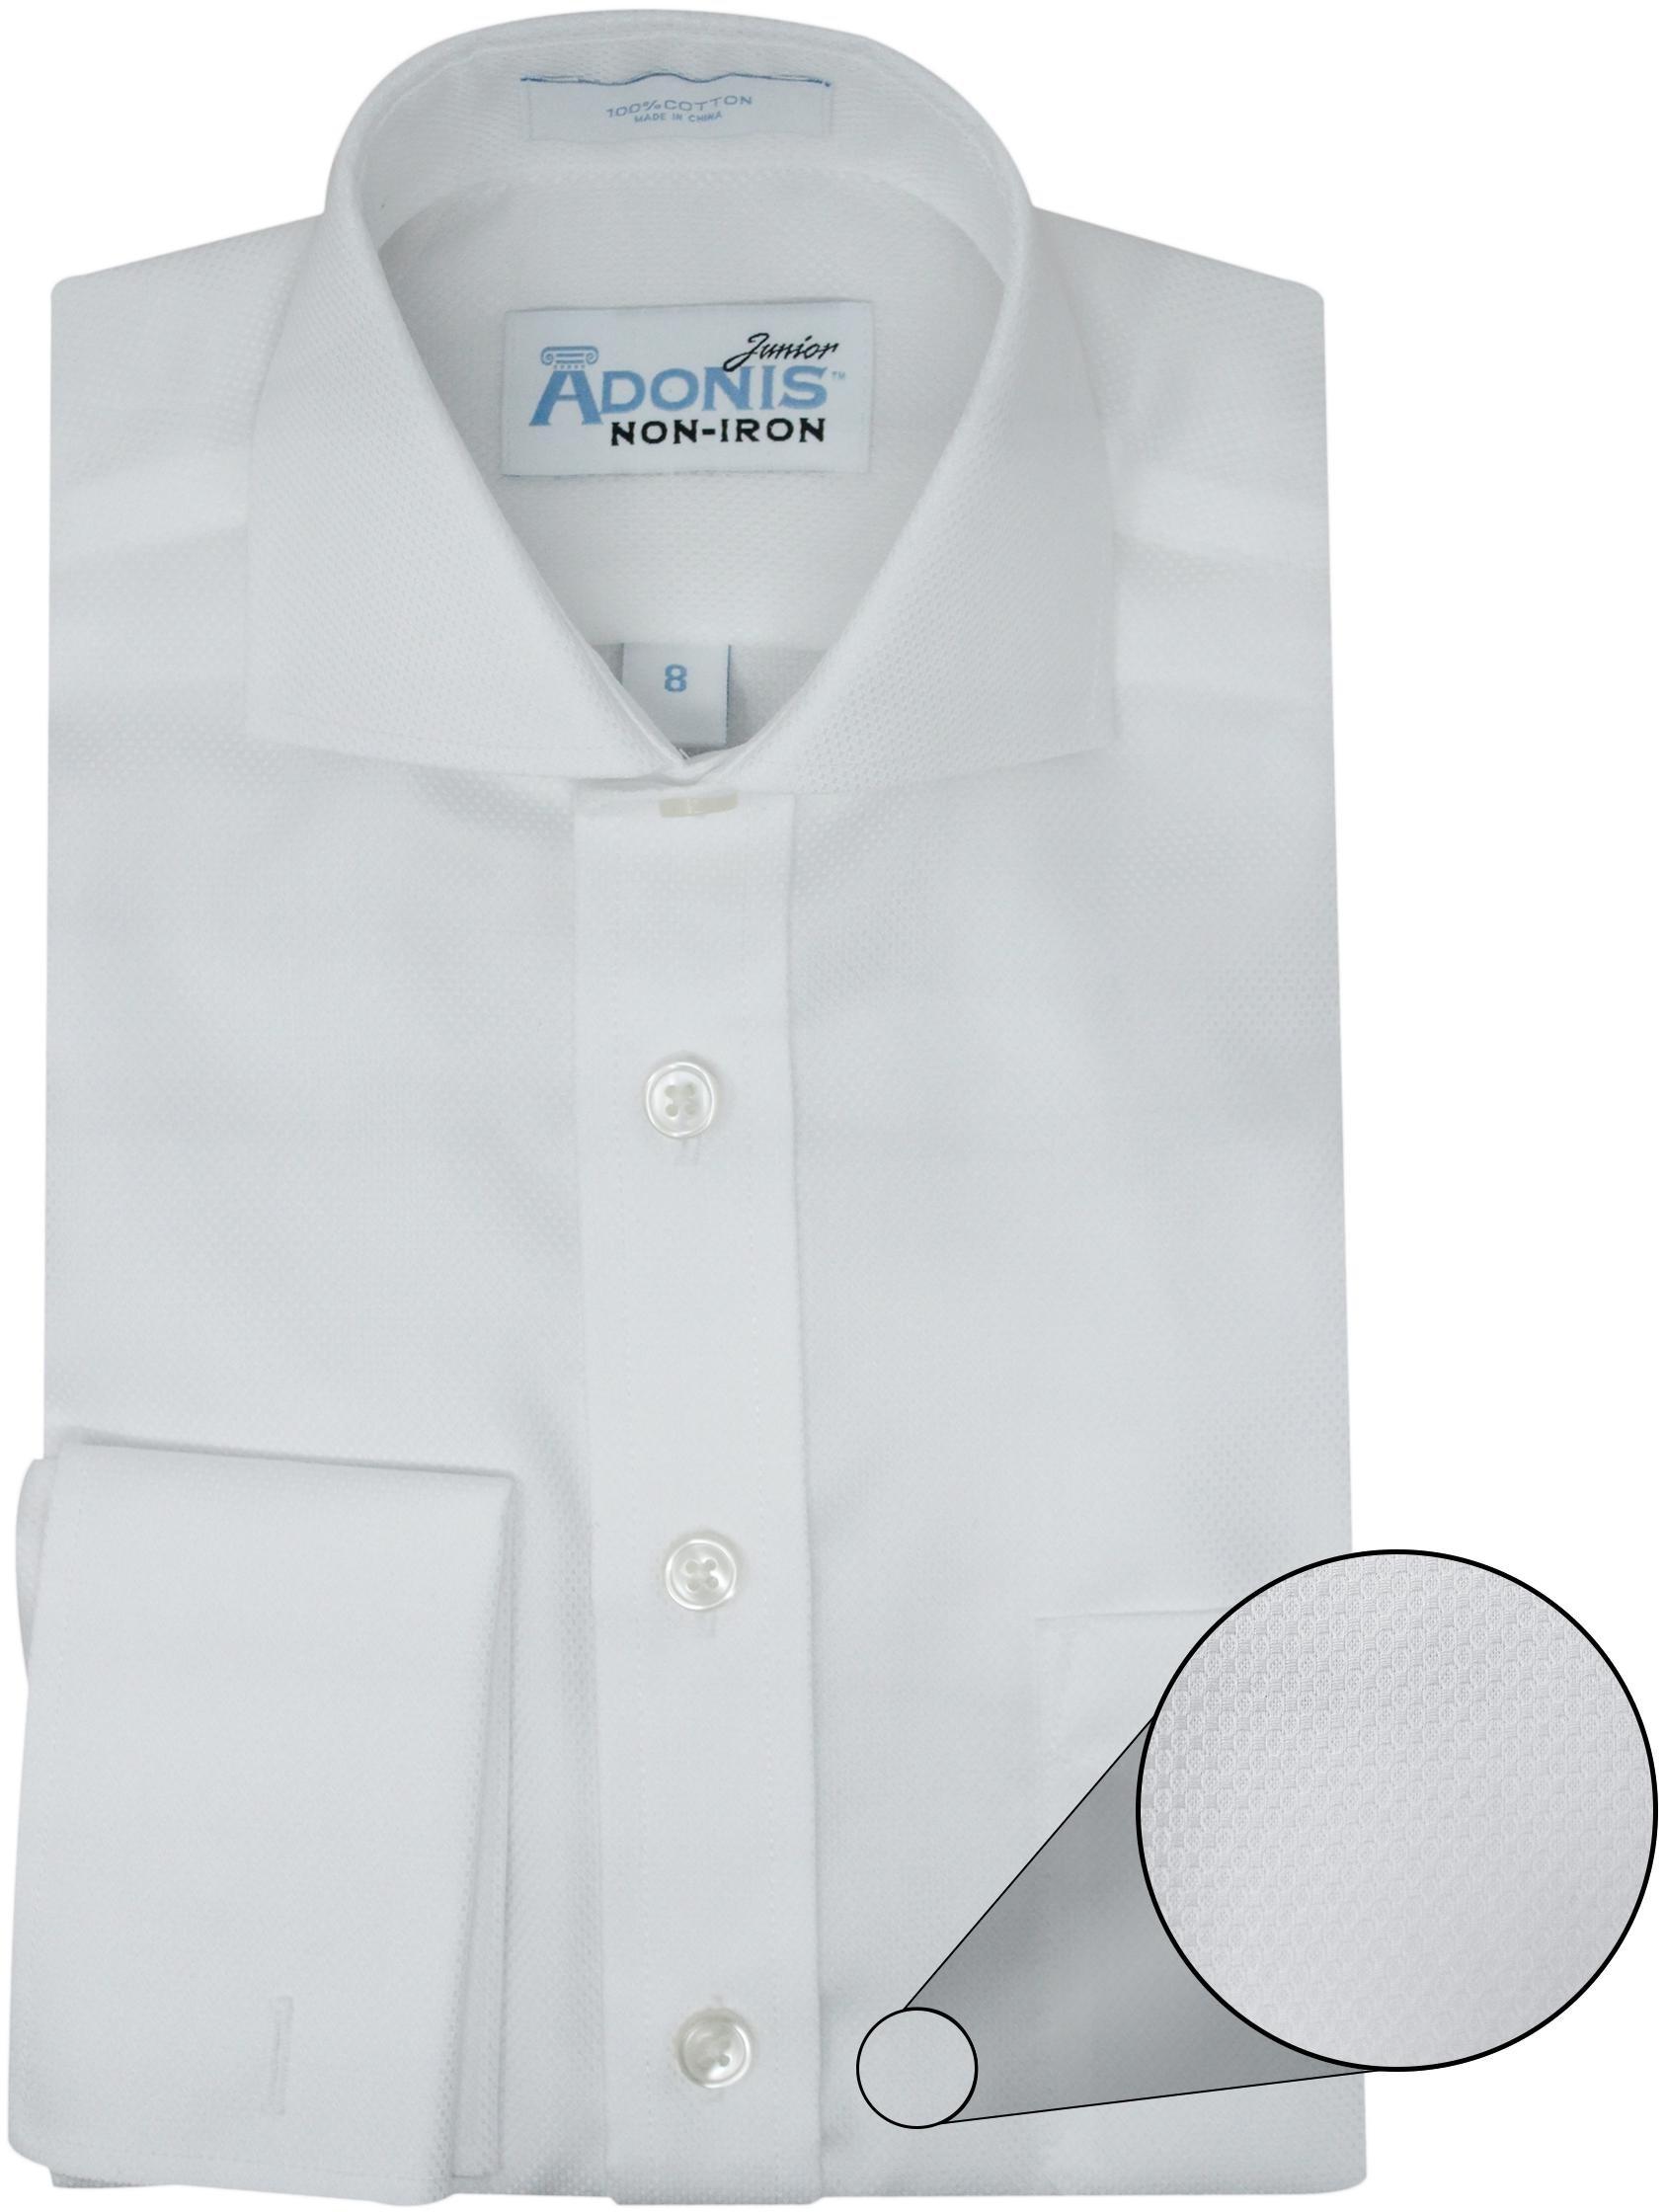 Adonis Boys 100% Cotton Non Iron White French Cuff Birdseye Pique Dress Shirt (Regular Fit) - White, 8